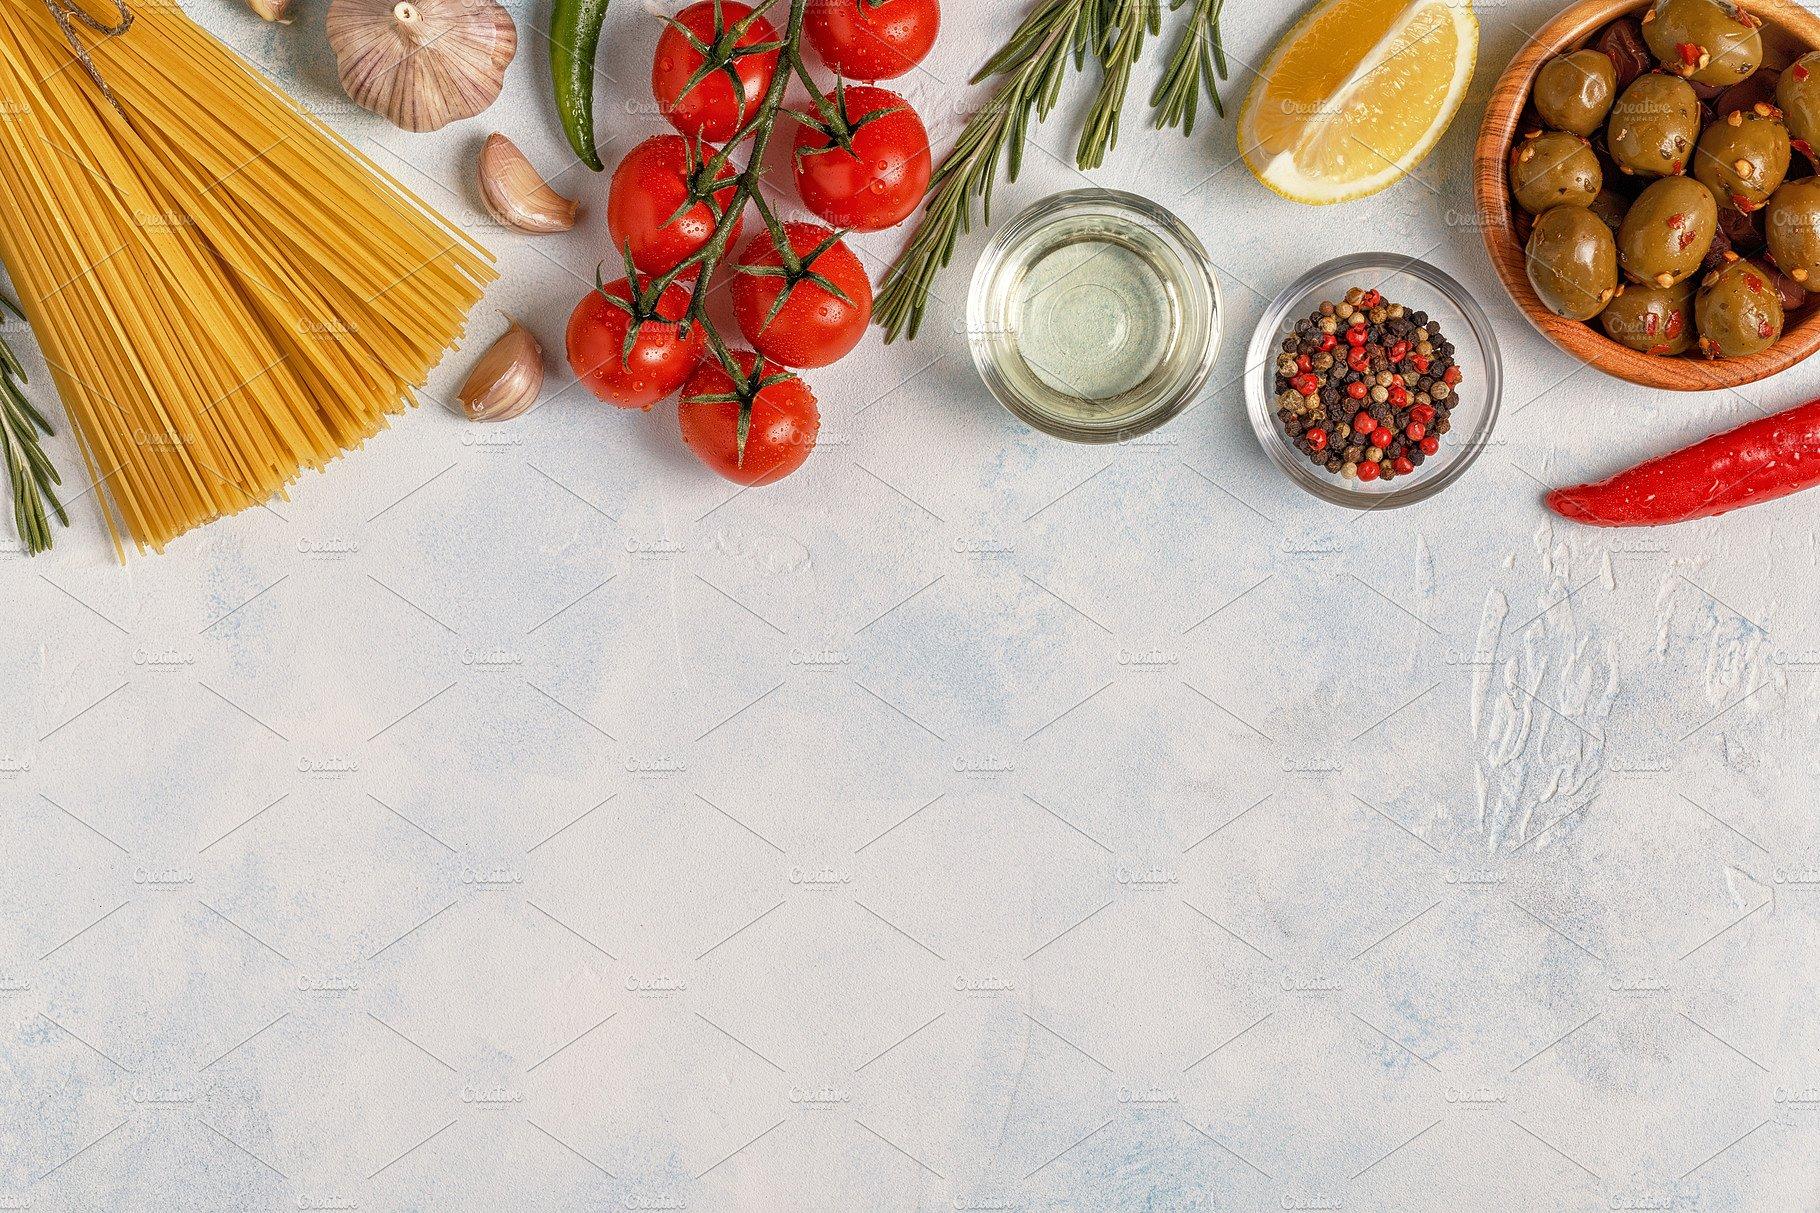 Italian food background ~ Food & Drink Photos ~ Creative Market